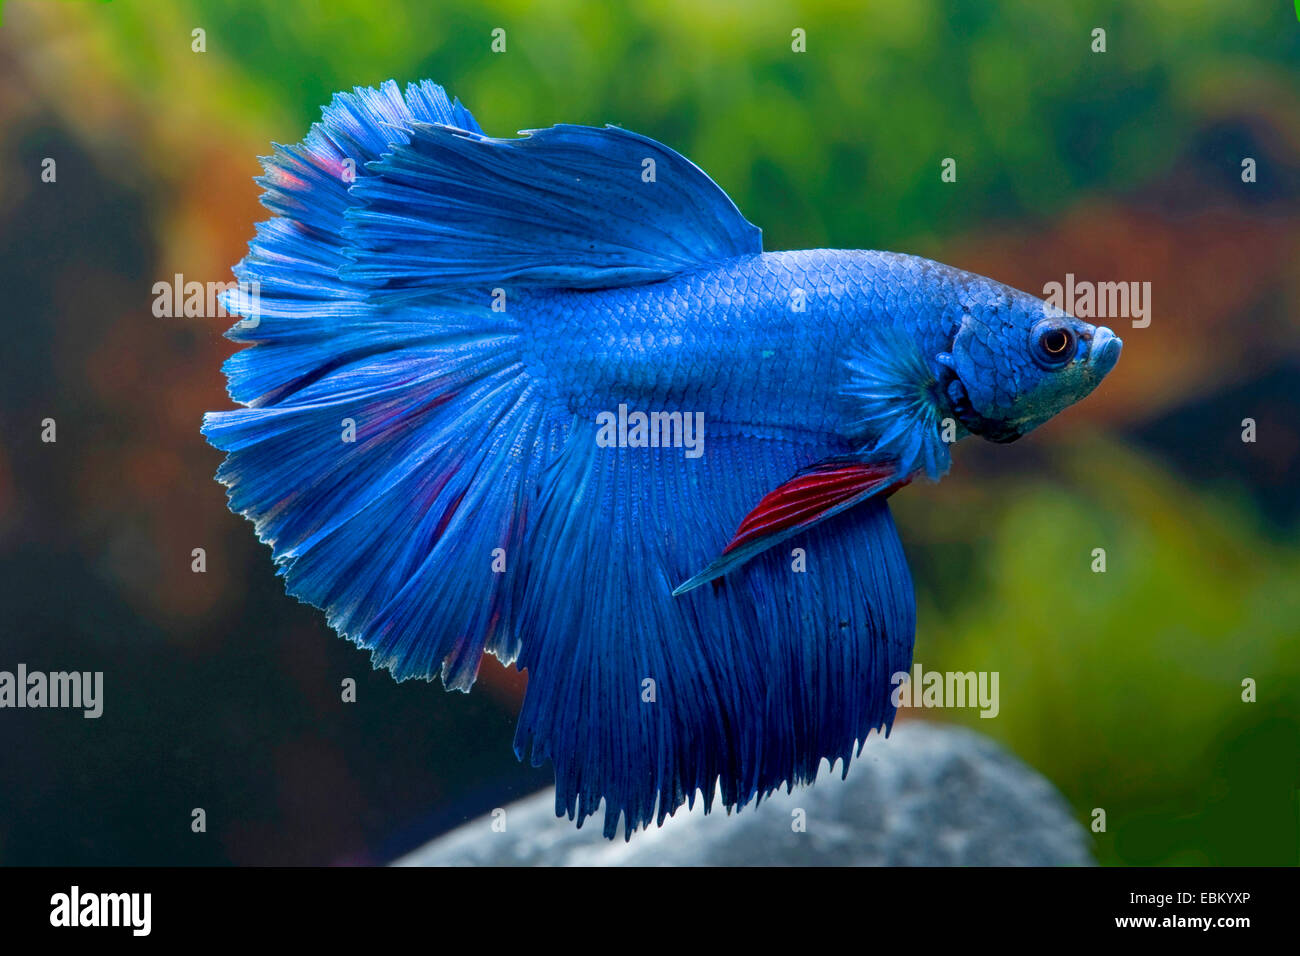 Siamese fighting fish, Siamese fighter (Betta splendens), breed Halfmoon blue - Stock Image